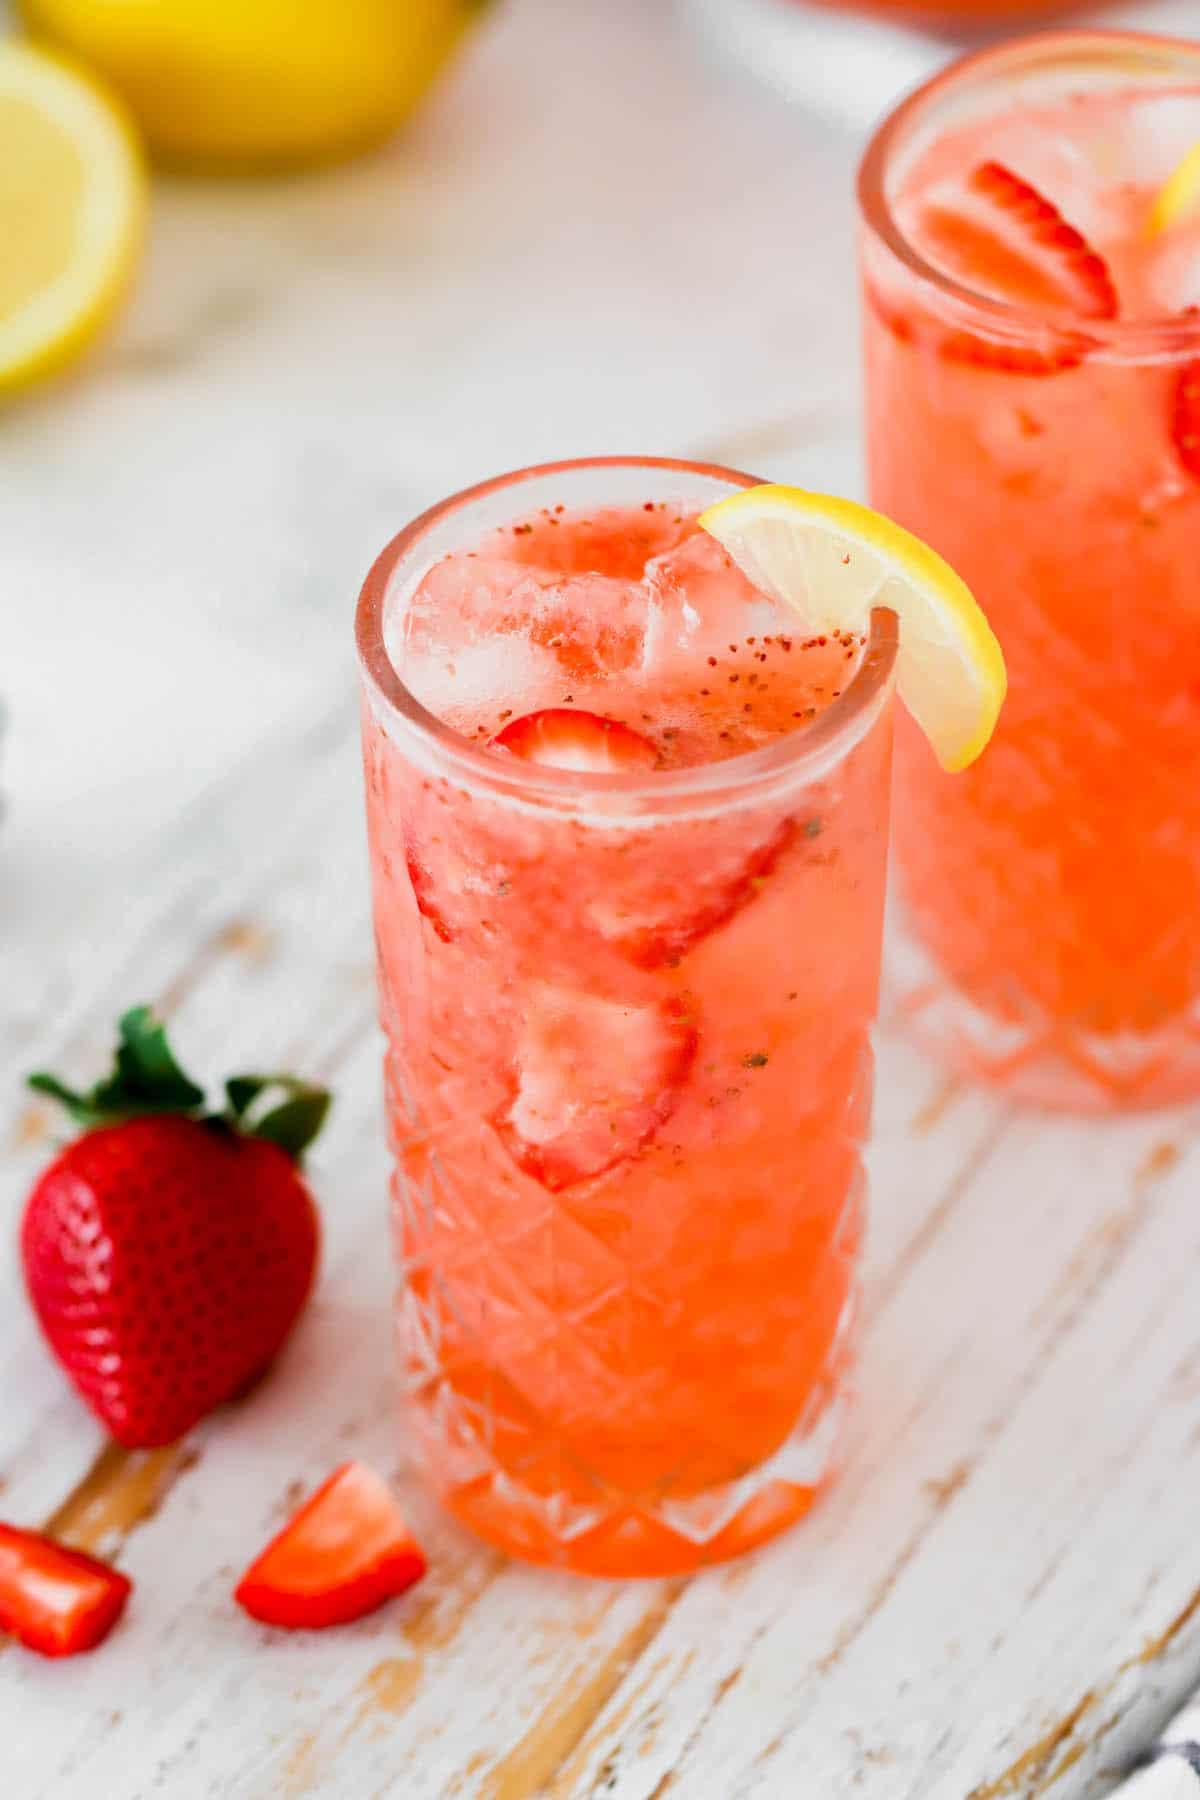 A glass of fresh strawberry lemonade with a lemon wedge